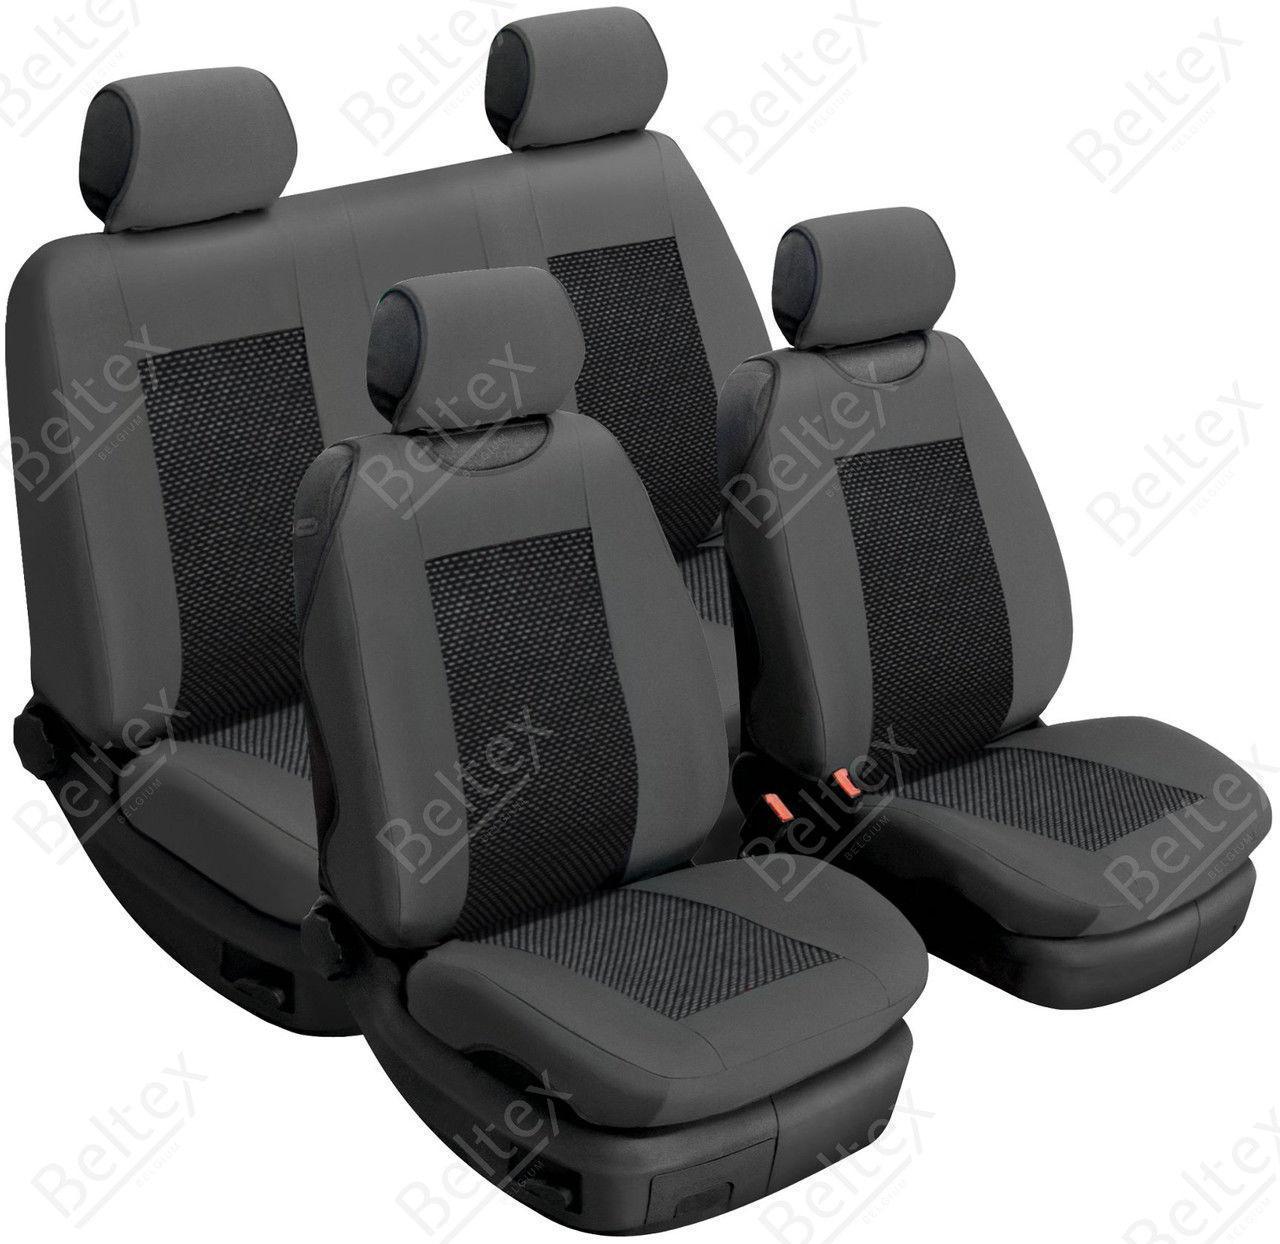 Майки/чехлы на сиденья Мазда 5 (Mazda 5)